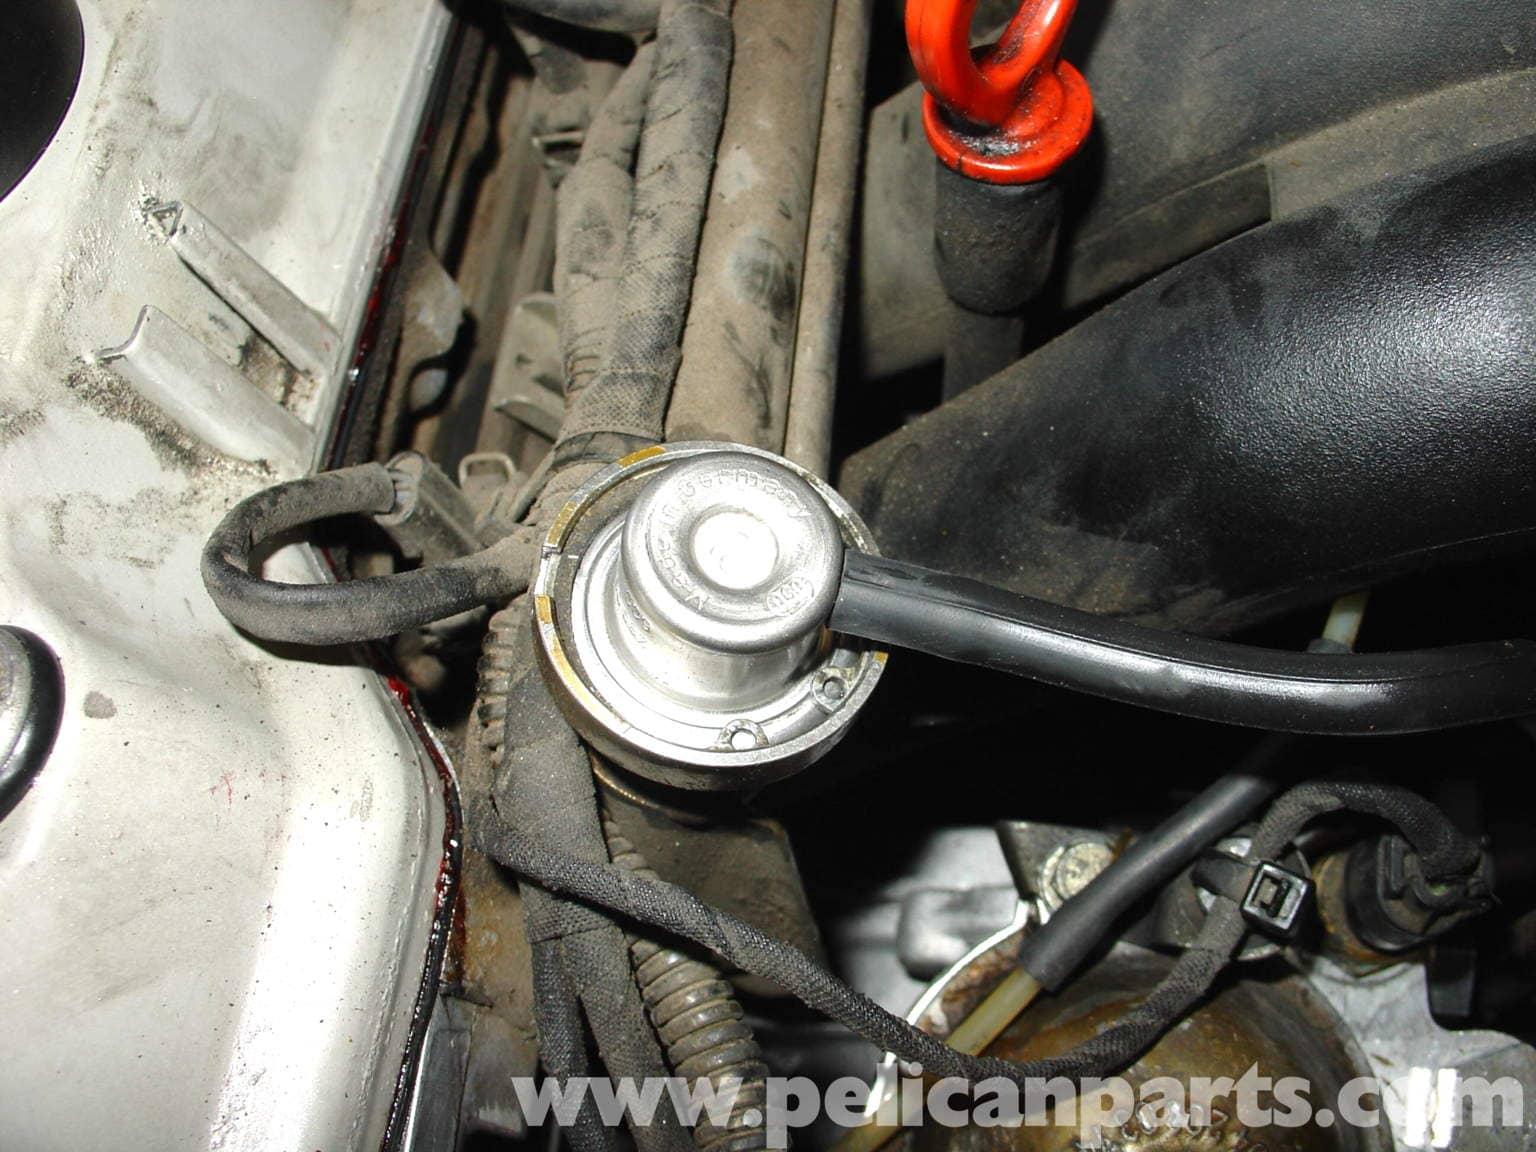 For Kc Light Relay Wiring Diagram Mercedes Benz W210 Fuel Pressure Regulator Replacement